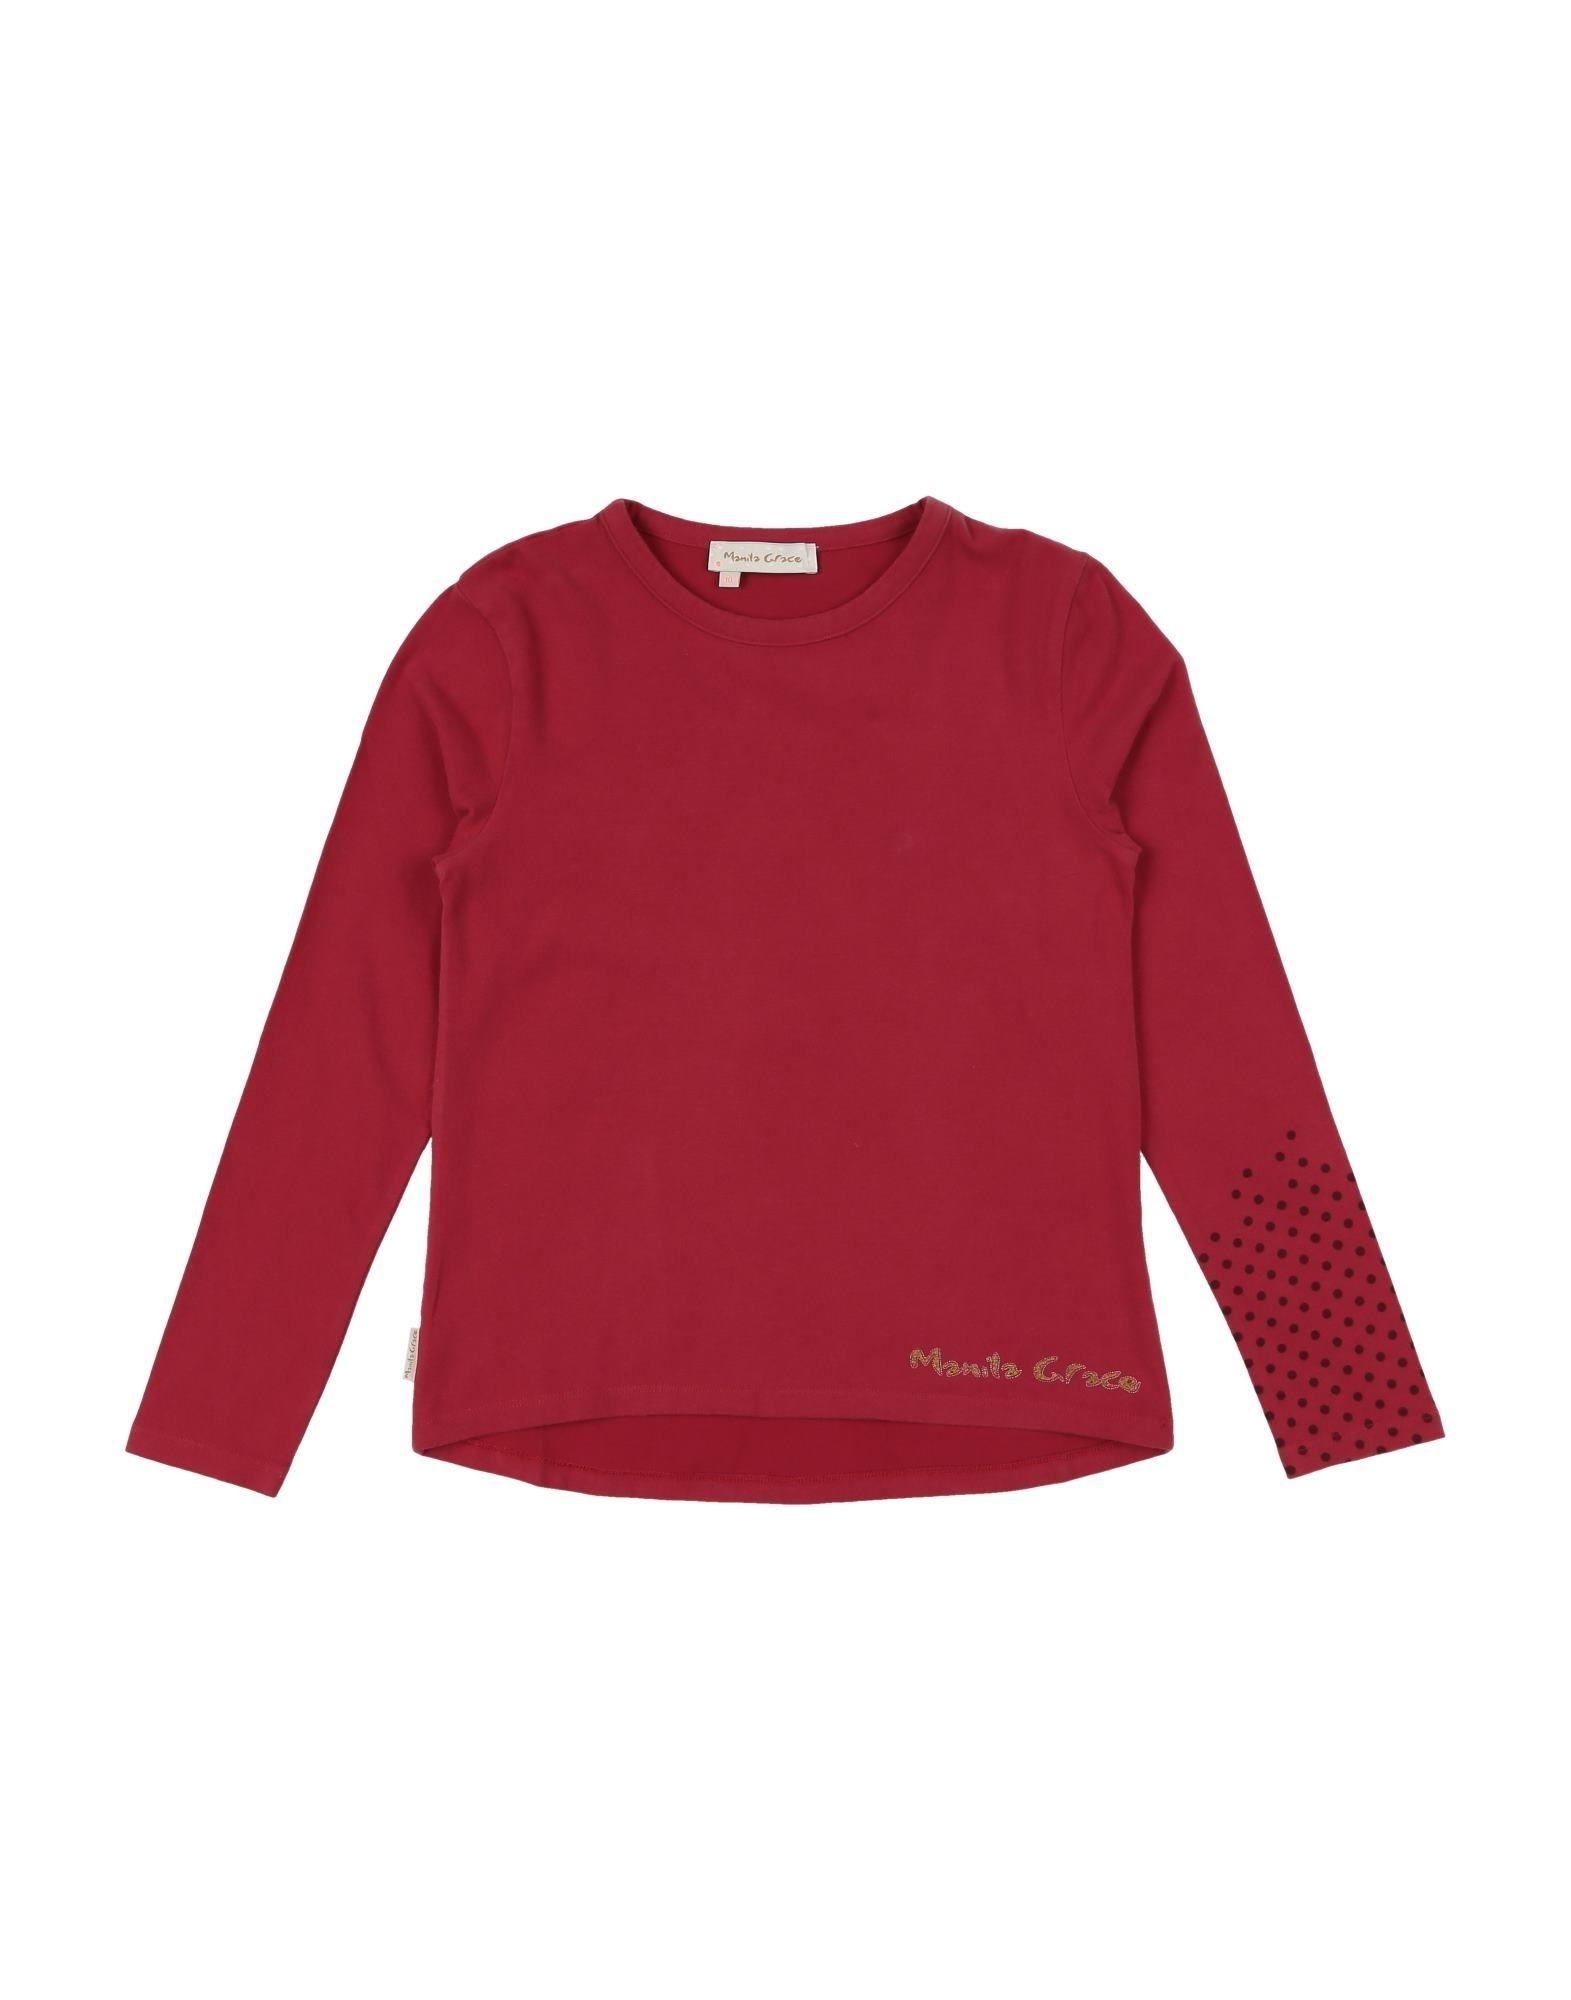 Manila Grace Kids' T-shirts In Red